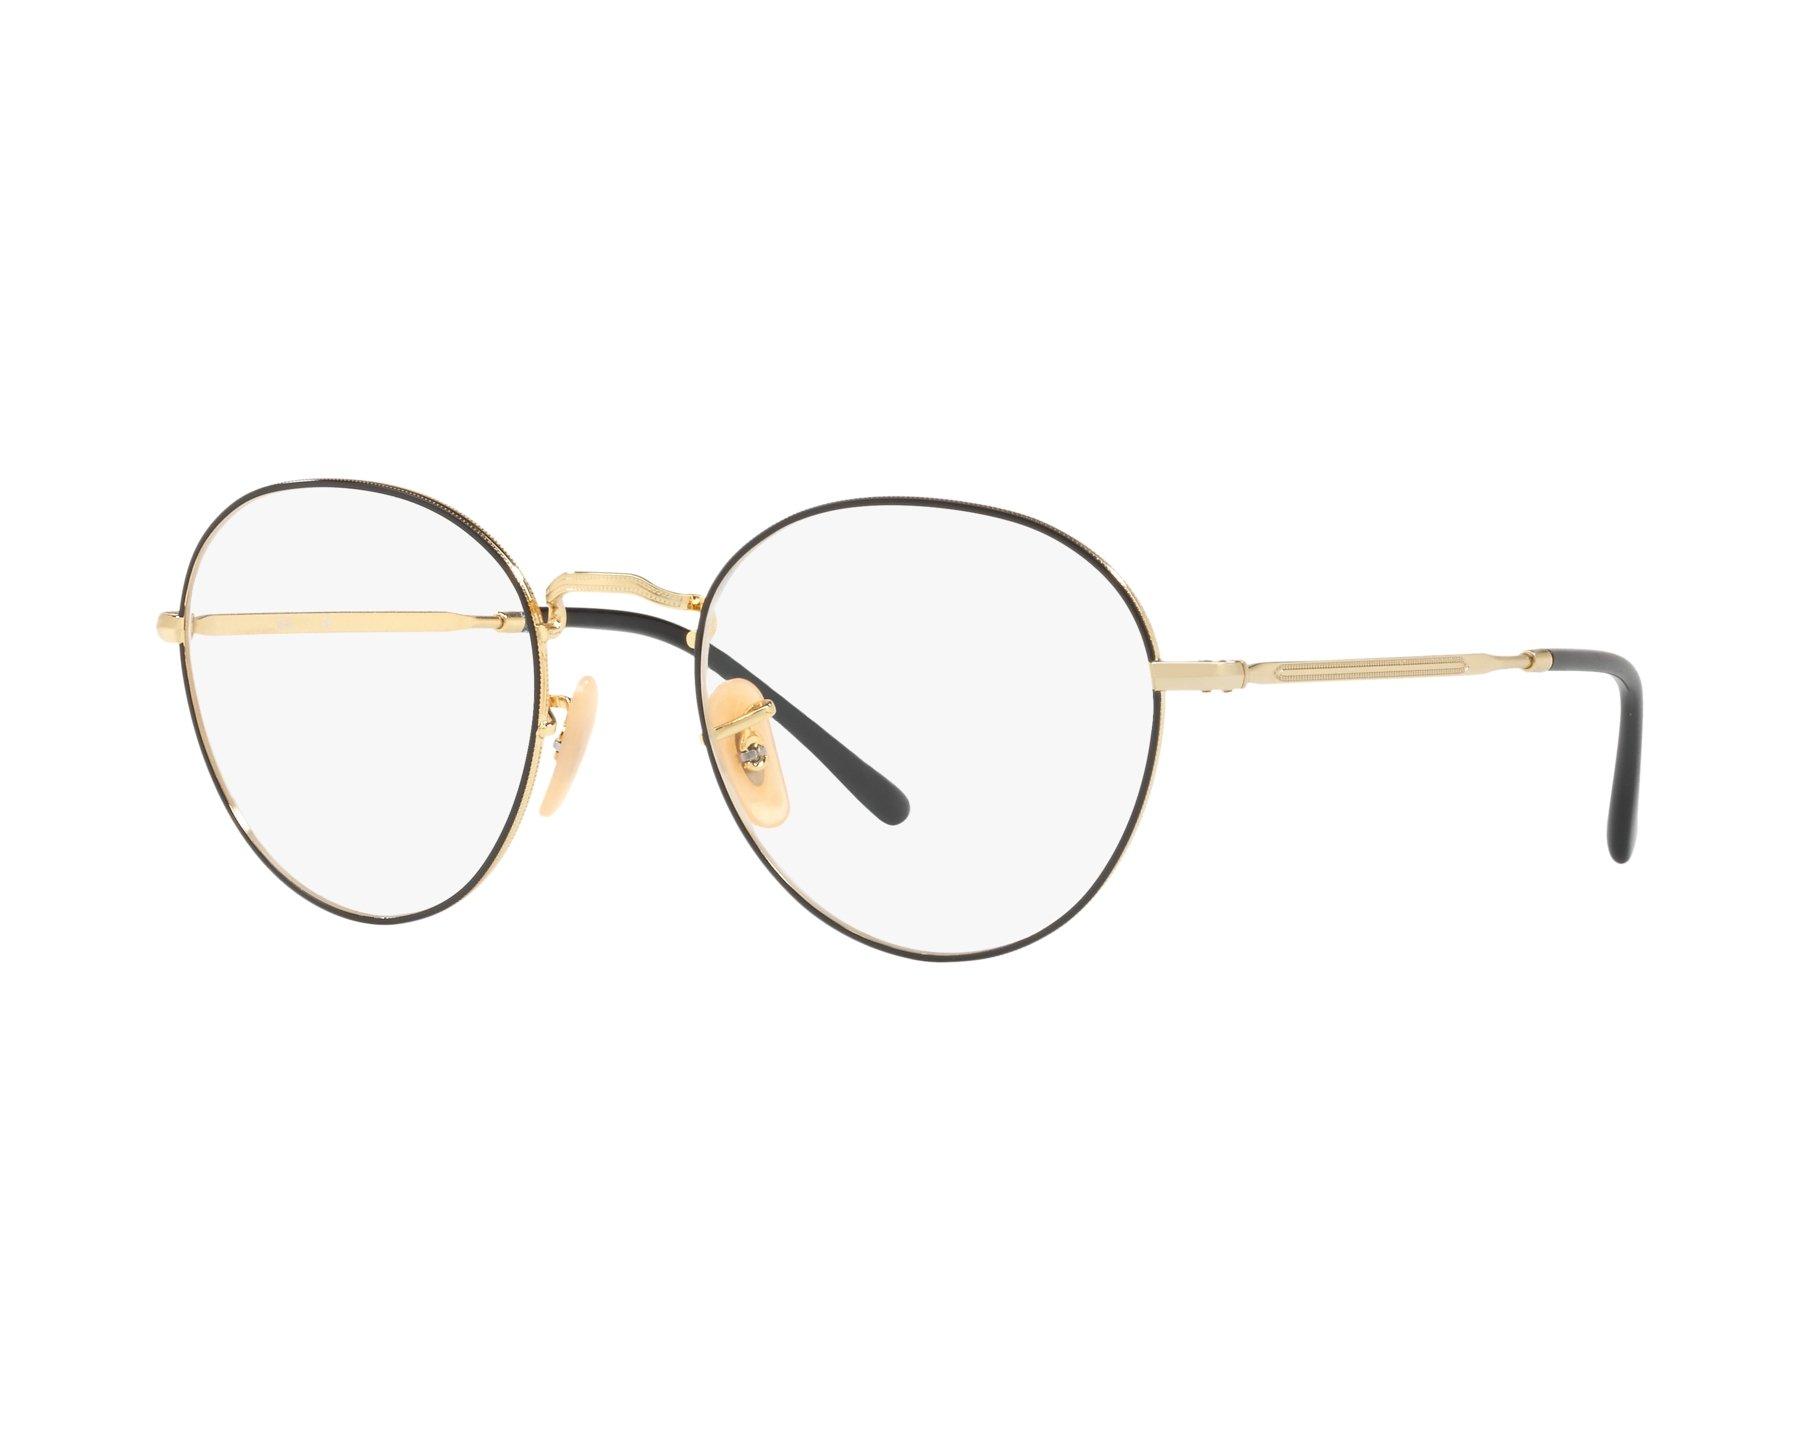 92d4f94465 eyeglasses Ray-Ban RX-3582-V 2946 49-20 Black Gold